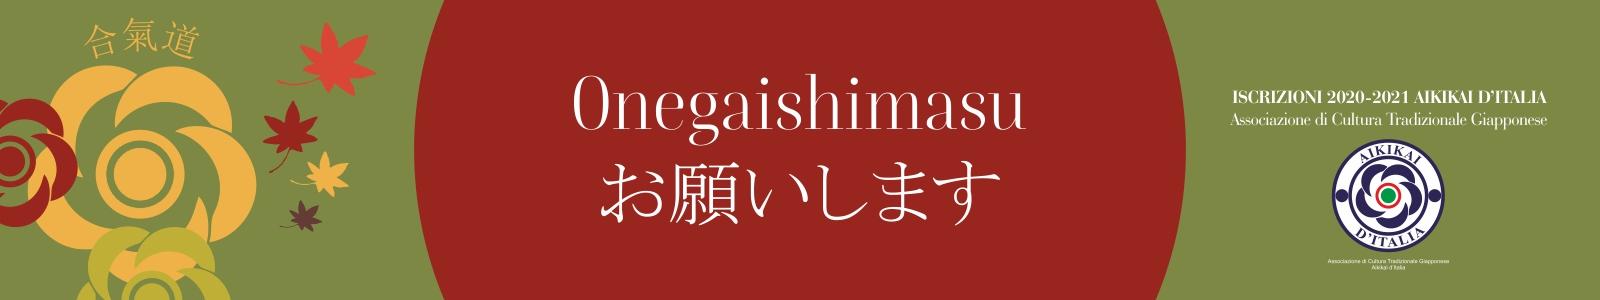 iscrizioni-aikikai-2020-2021-a13